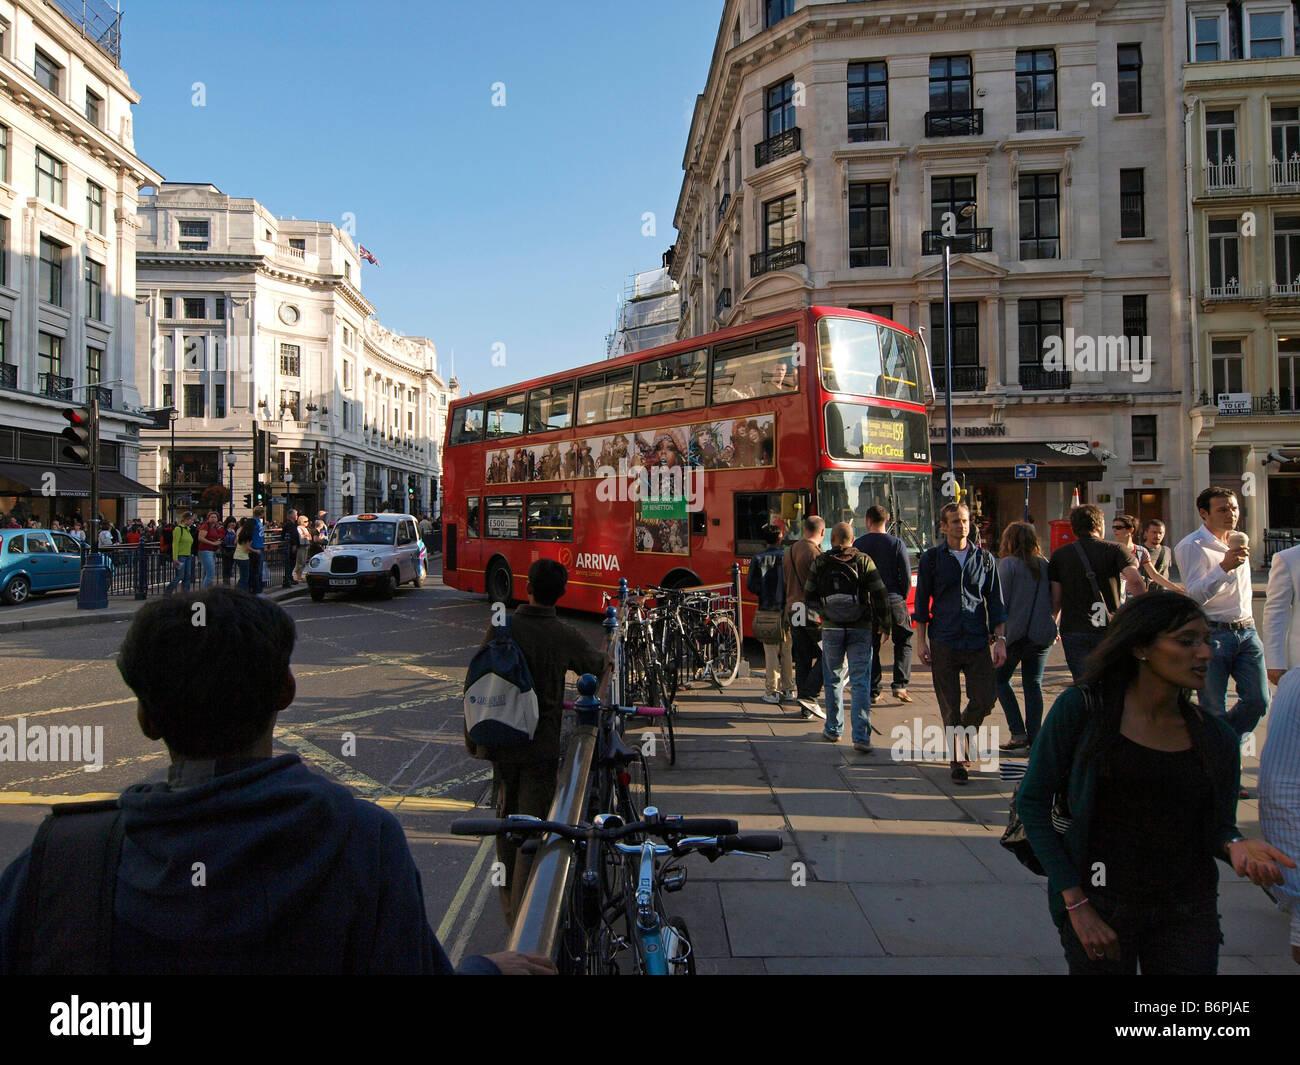 Regent street with many people shopping London UK - Stock Image